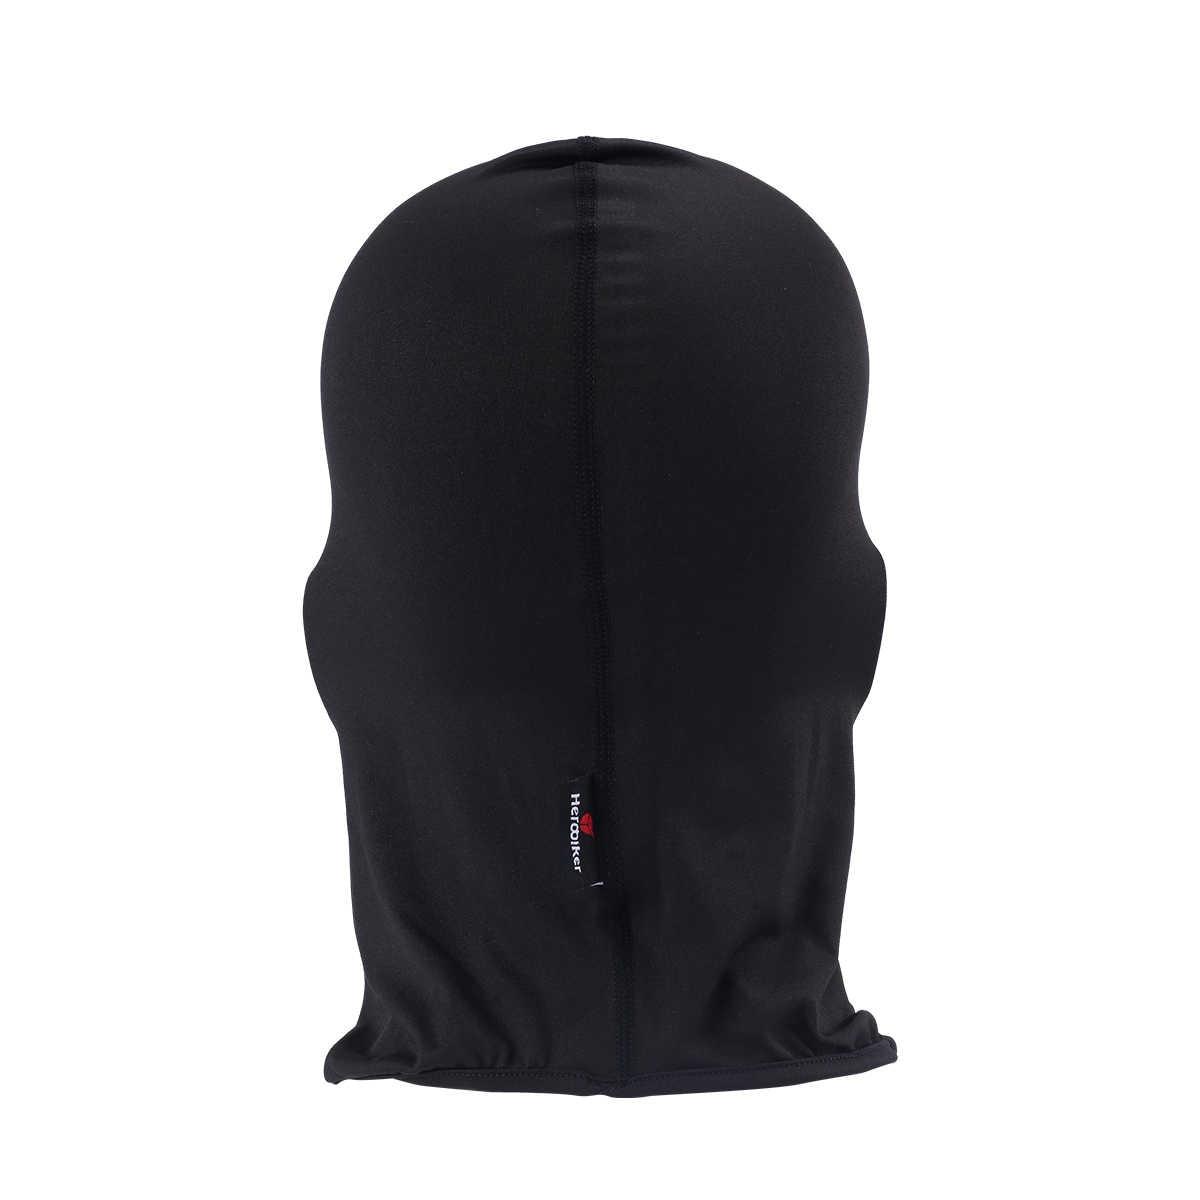 HEROBIKER Балаклава мотоциклетная маска для лица мотоциклетный шлем бандана капюшон Лыжная маска для всего лица ветрозащитная Пылезащитная маска для лица